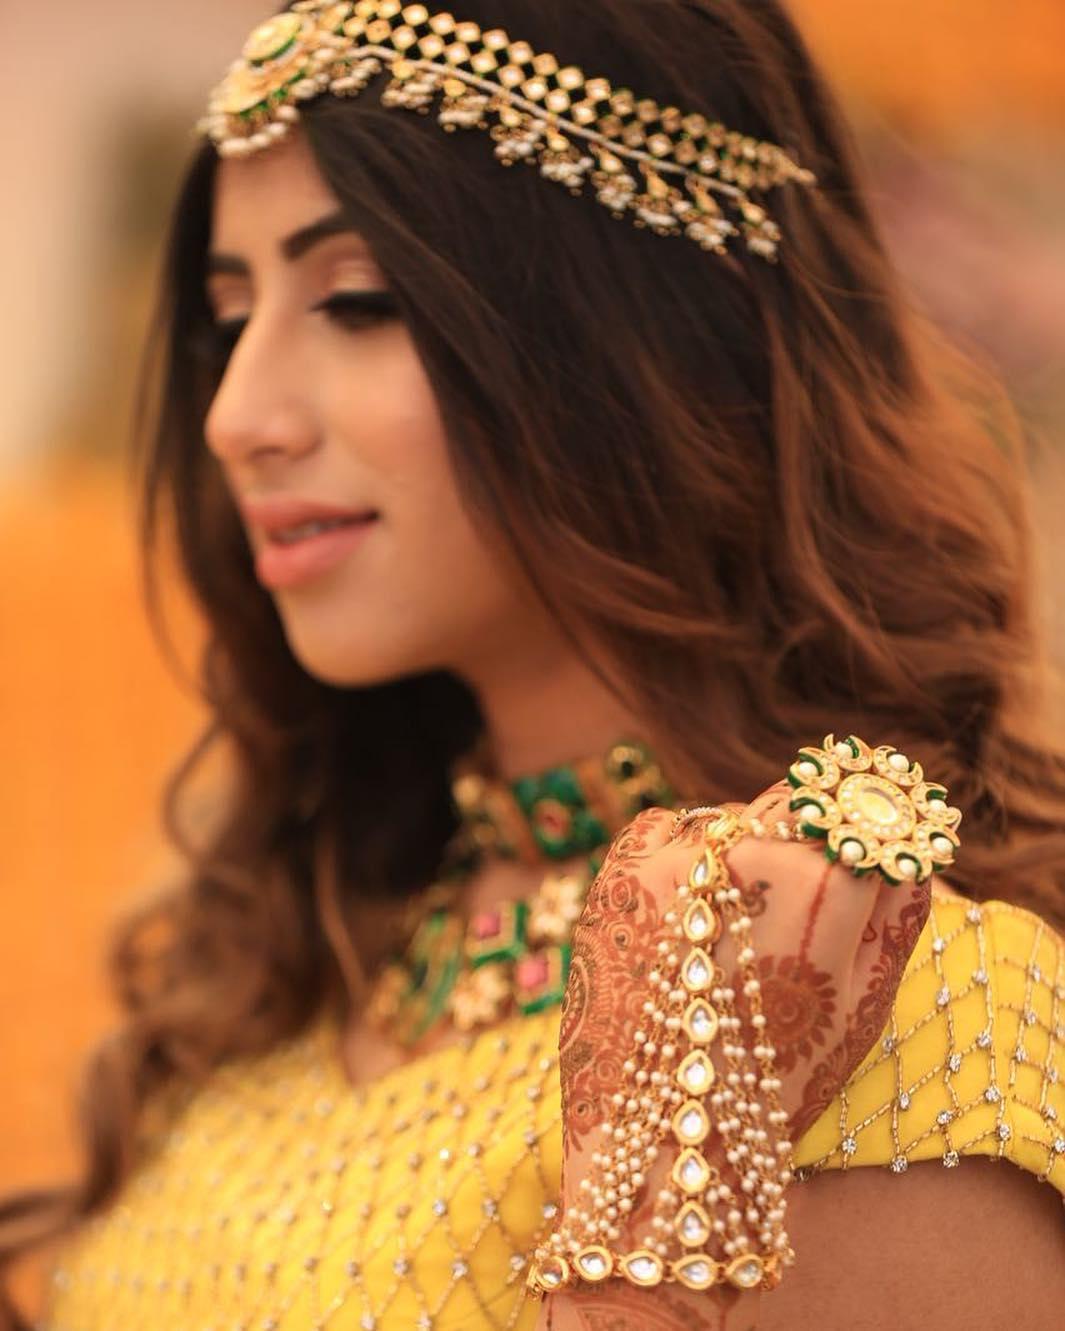 indian wedding, bride, mehendi hands, henna hands, bridal outfit, jewellery, hathphool, kundan jewellery, hathphool ideas, hathphool inspirations, yellow outfit, mehendi outfit, henna outfit, mehendi outfit ideas